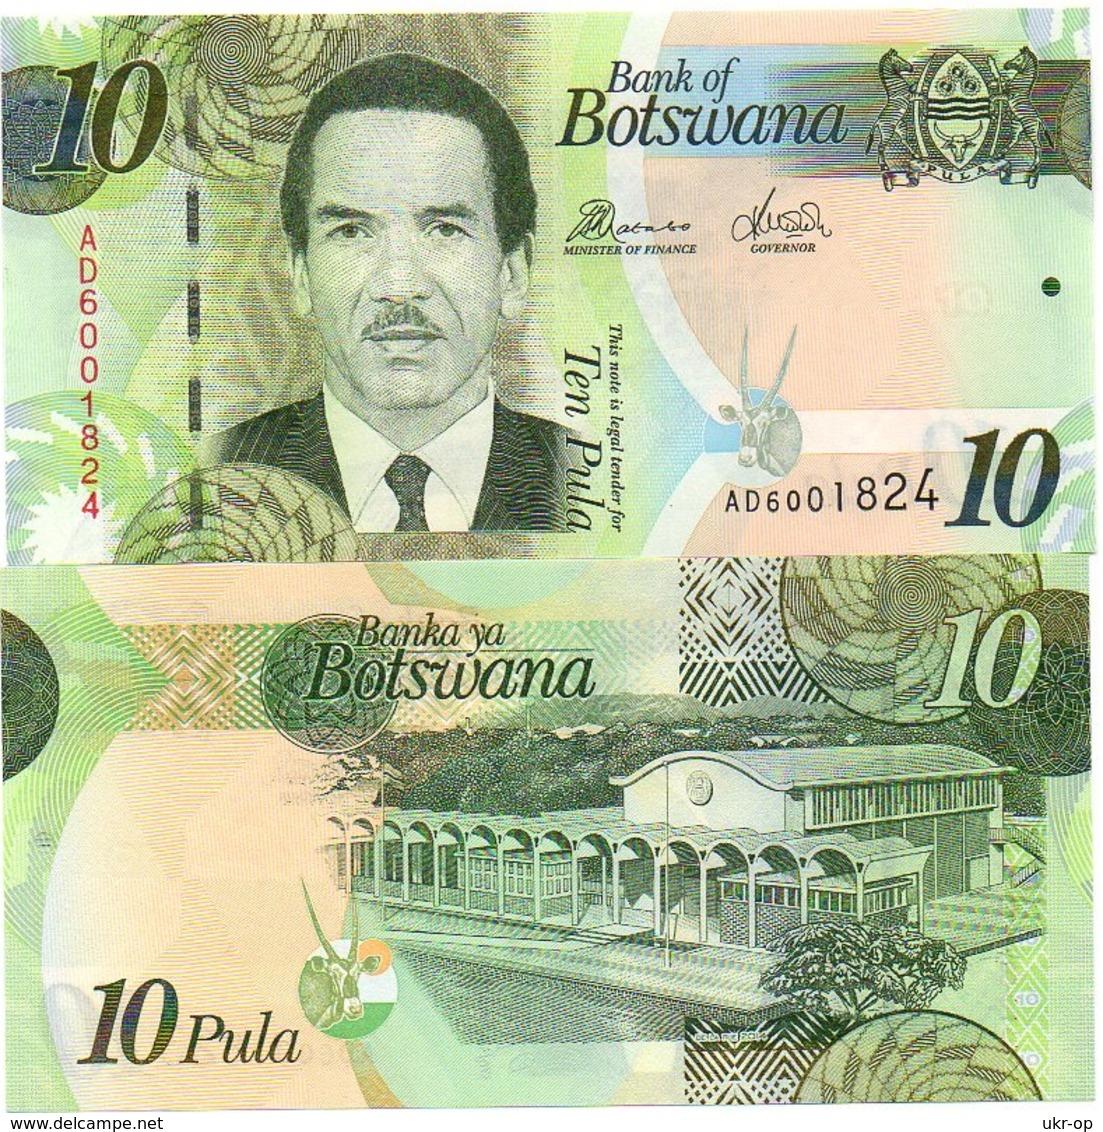 Botswana - 10 Pula 2014 UNC Paper Ukr-OP - Botswana